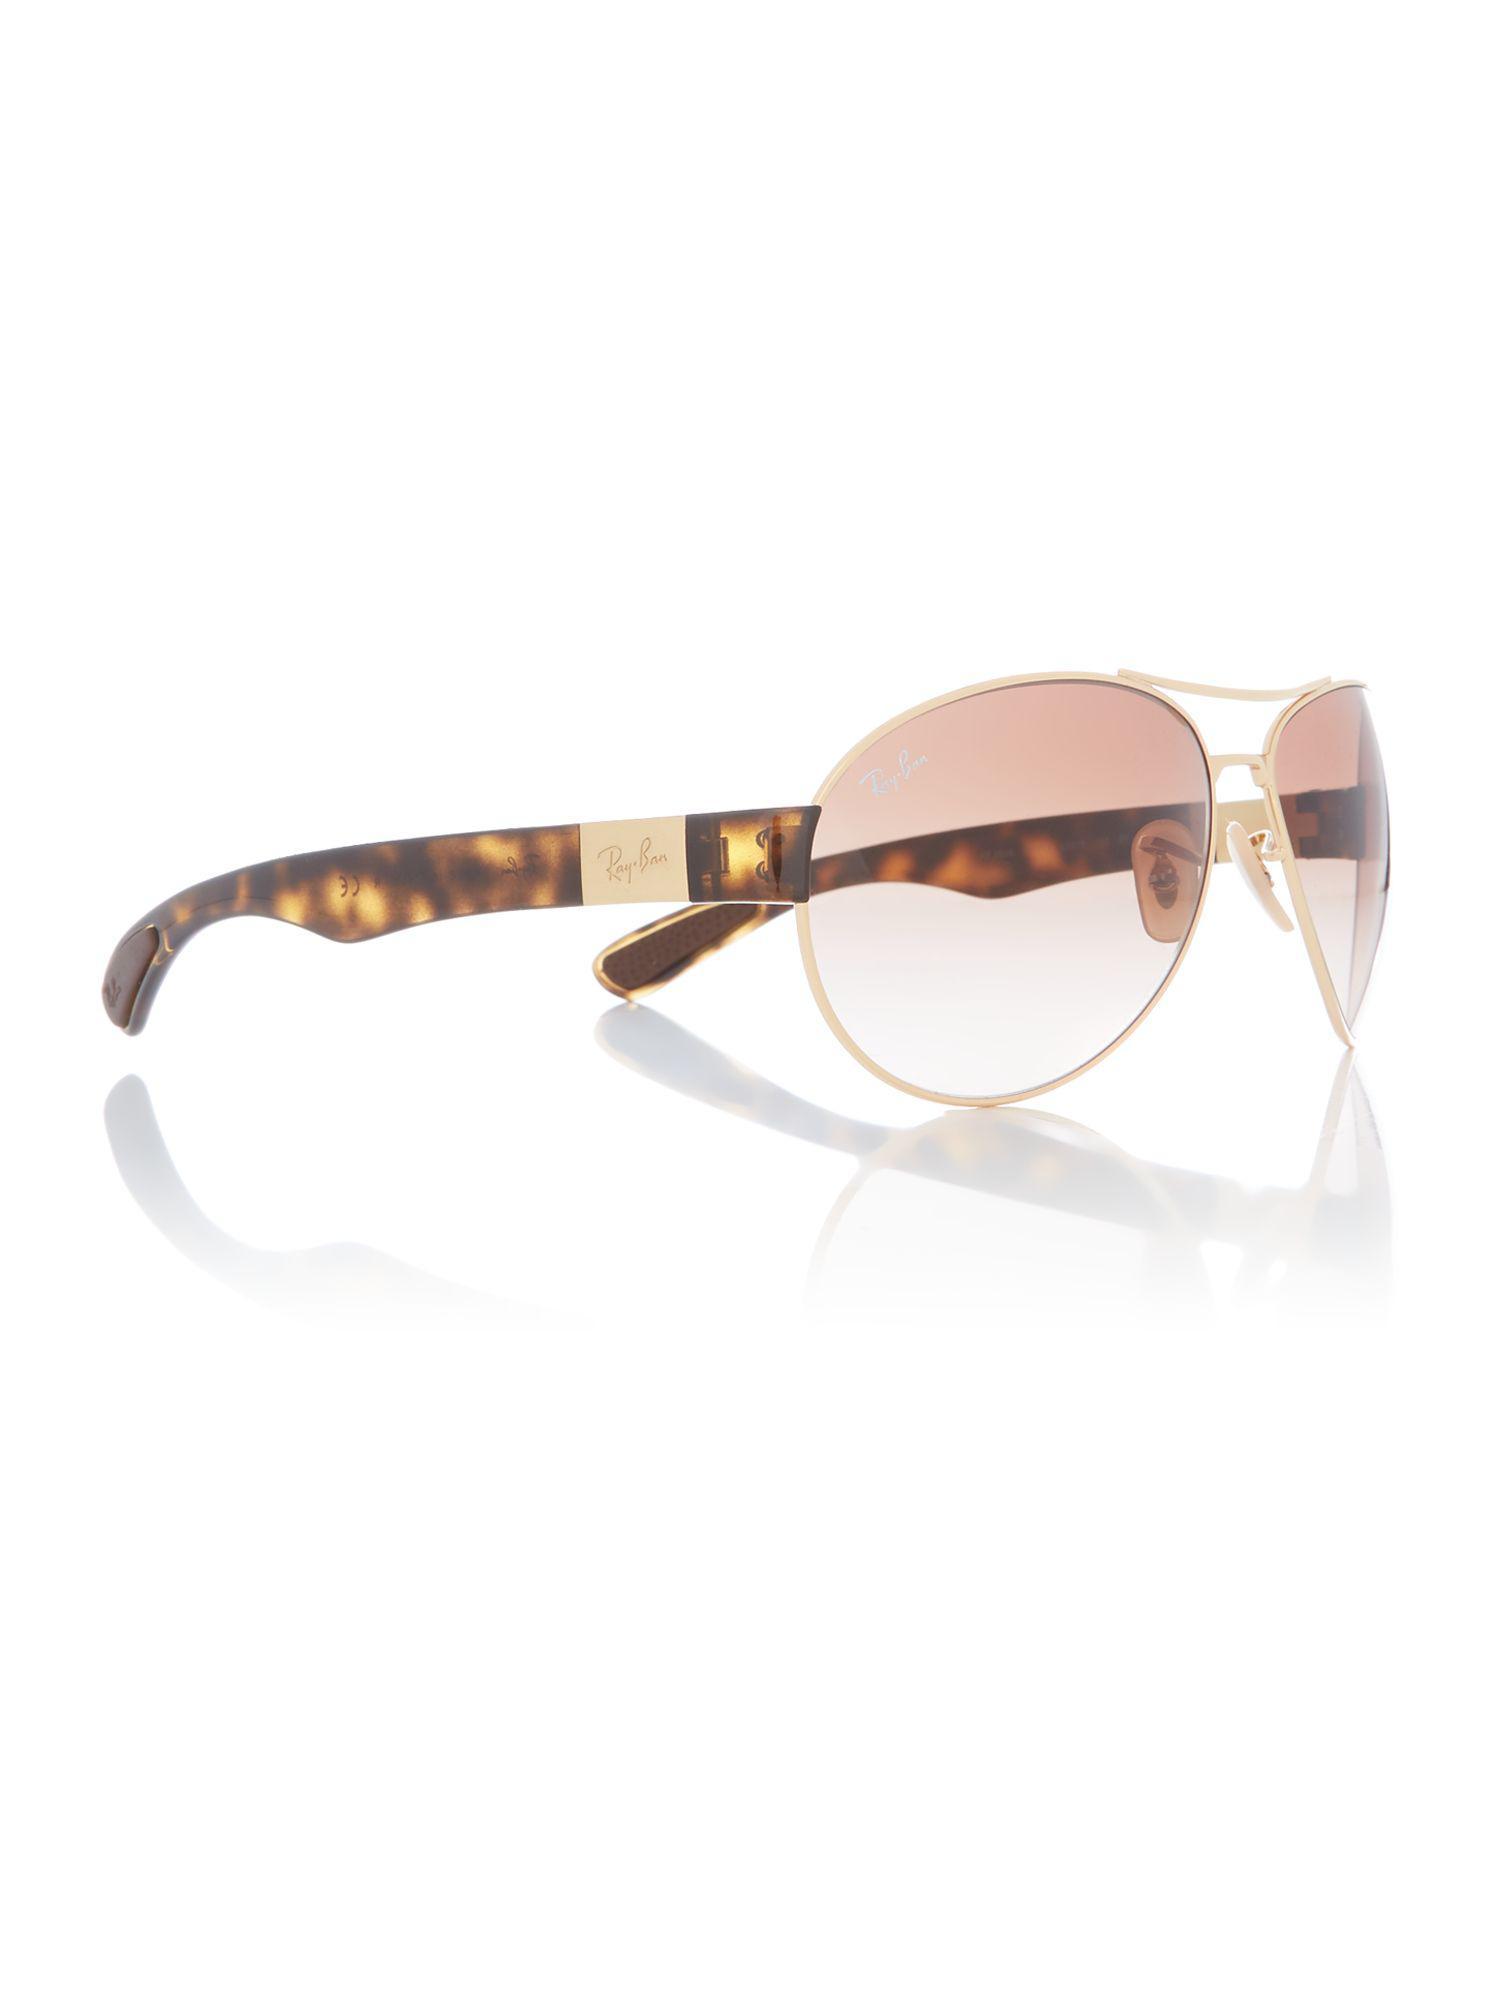 9e0c7bfc22 Ray-Ban Arista 0rb3509 Pilot Sunglasses for Men - Lyst